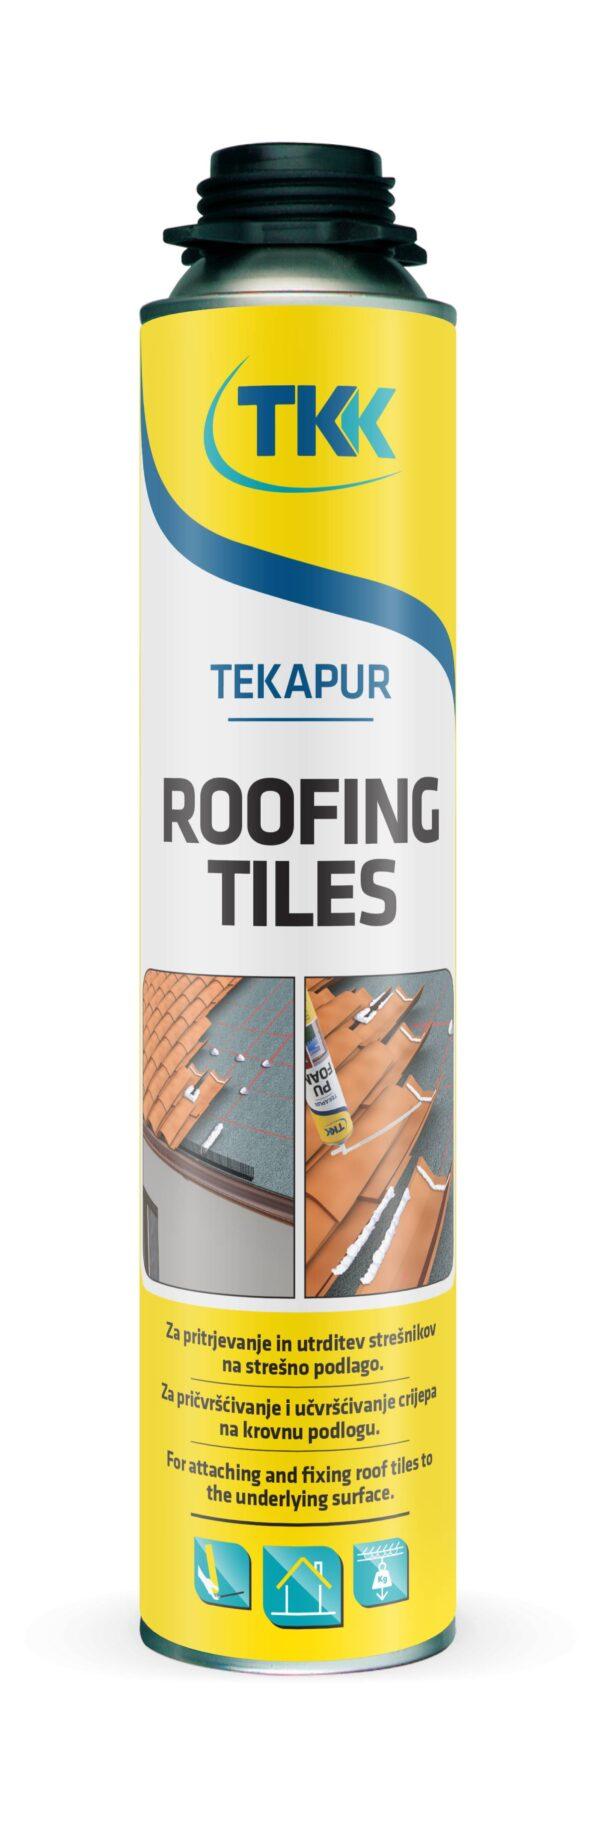 Schiuma poliuretanica per coppi e tegole manuale 750 ml Tekapur Roofing Tiles